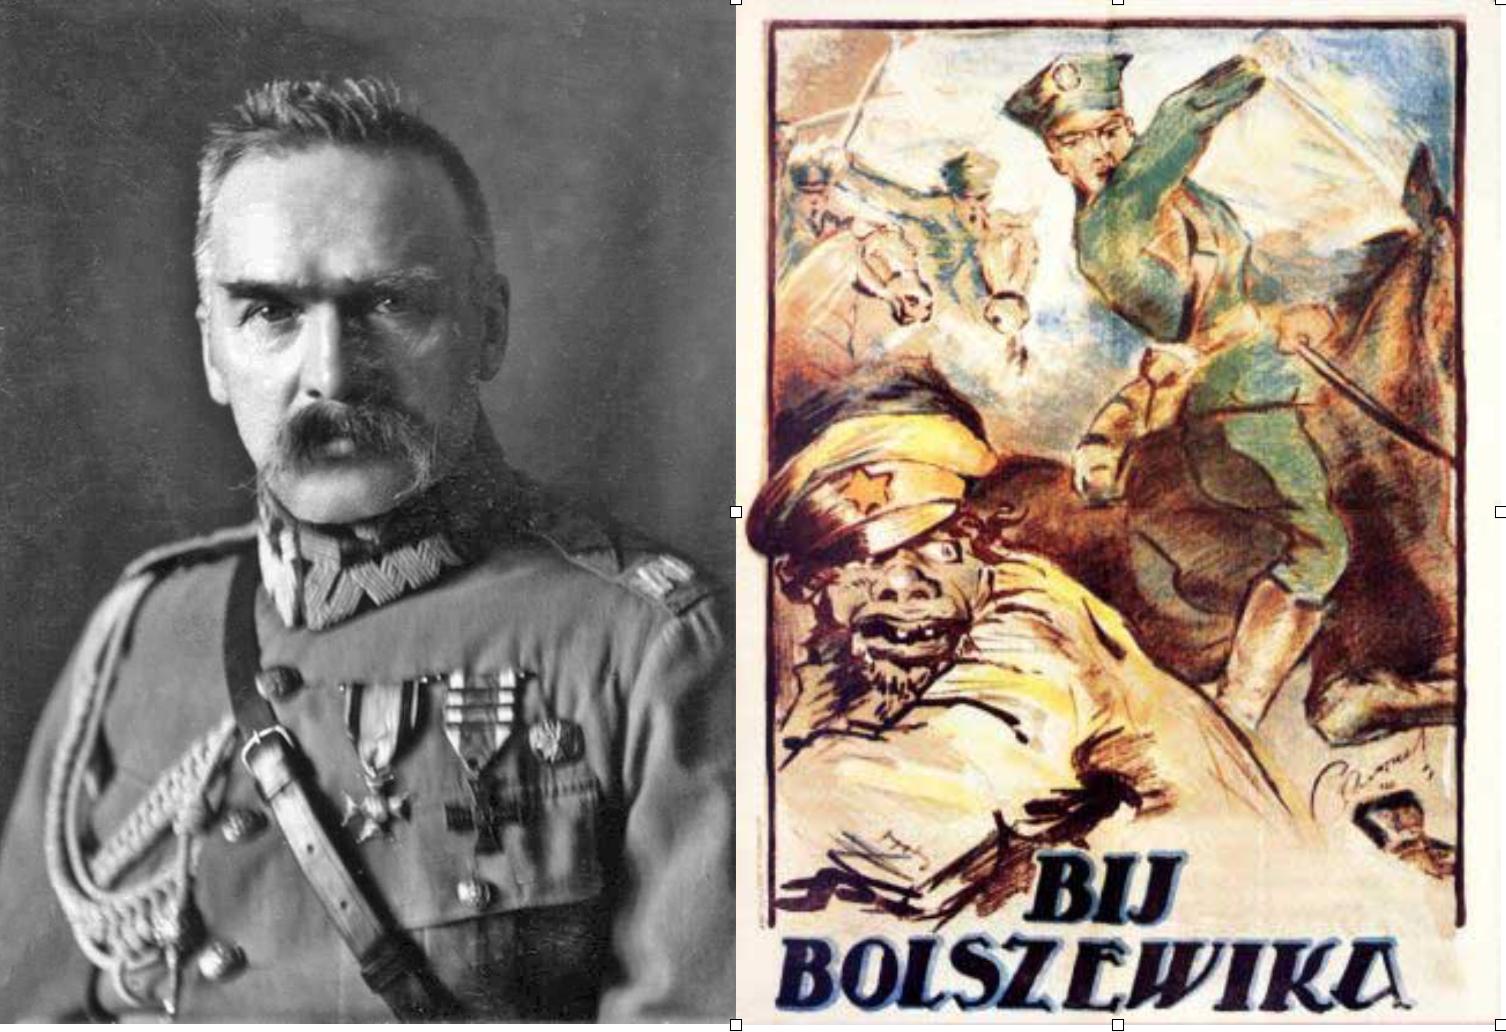 Józef Piłsudski y a la derecha propaganda polaca anti-bolchevique (guerra 1920)